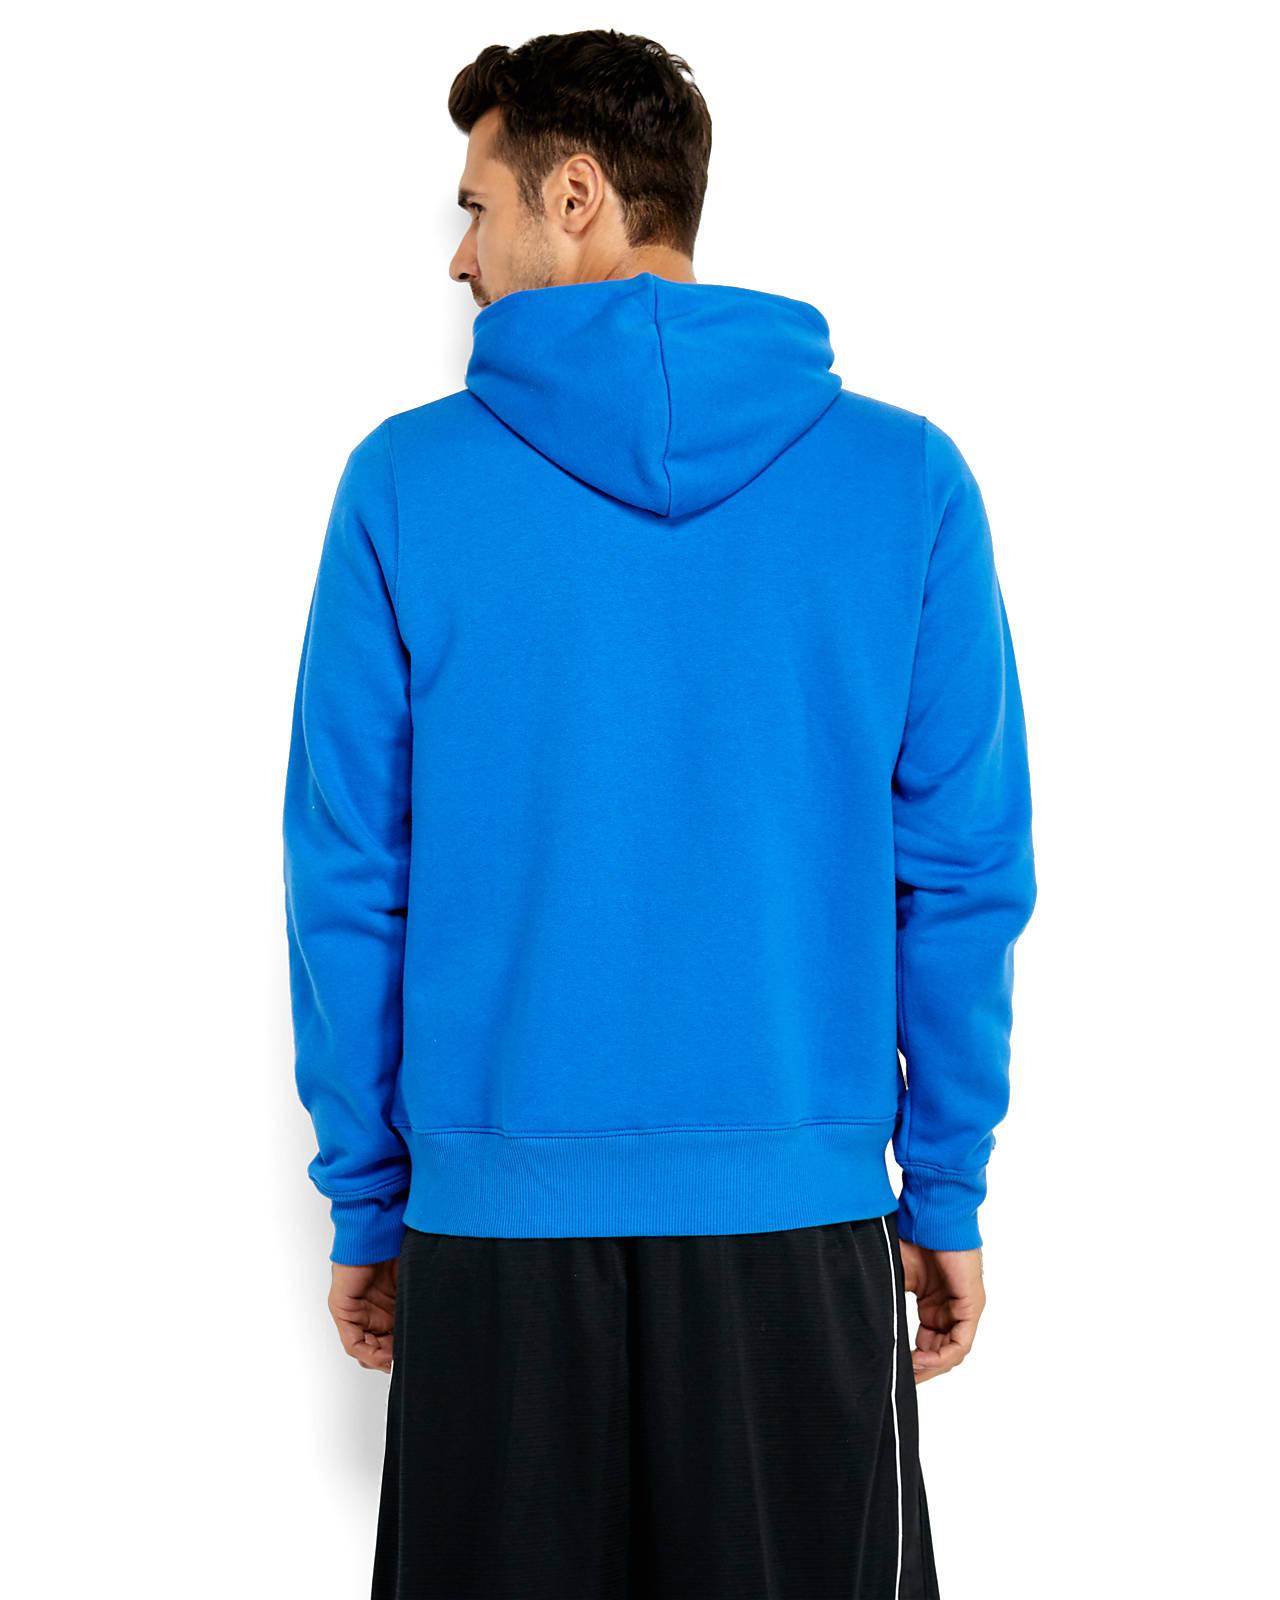 new balance full zip hoodie in blue for men lyst. Black Bedroom Furniture Sets. Home Design Ideas